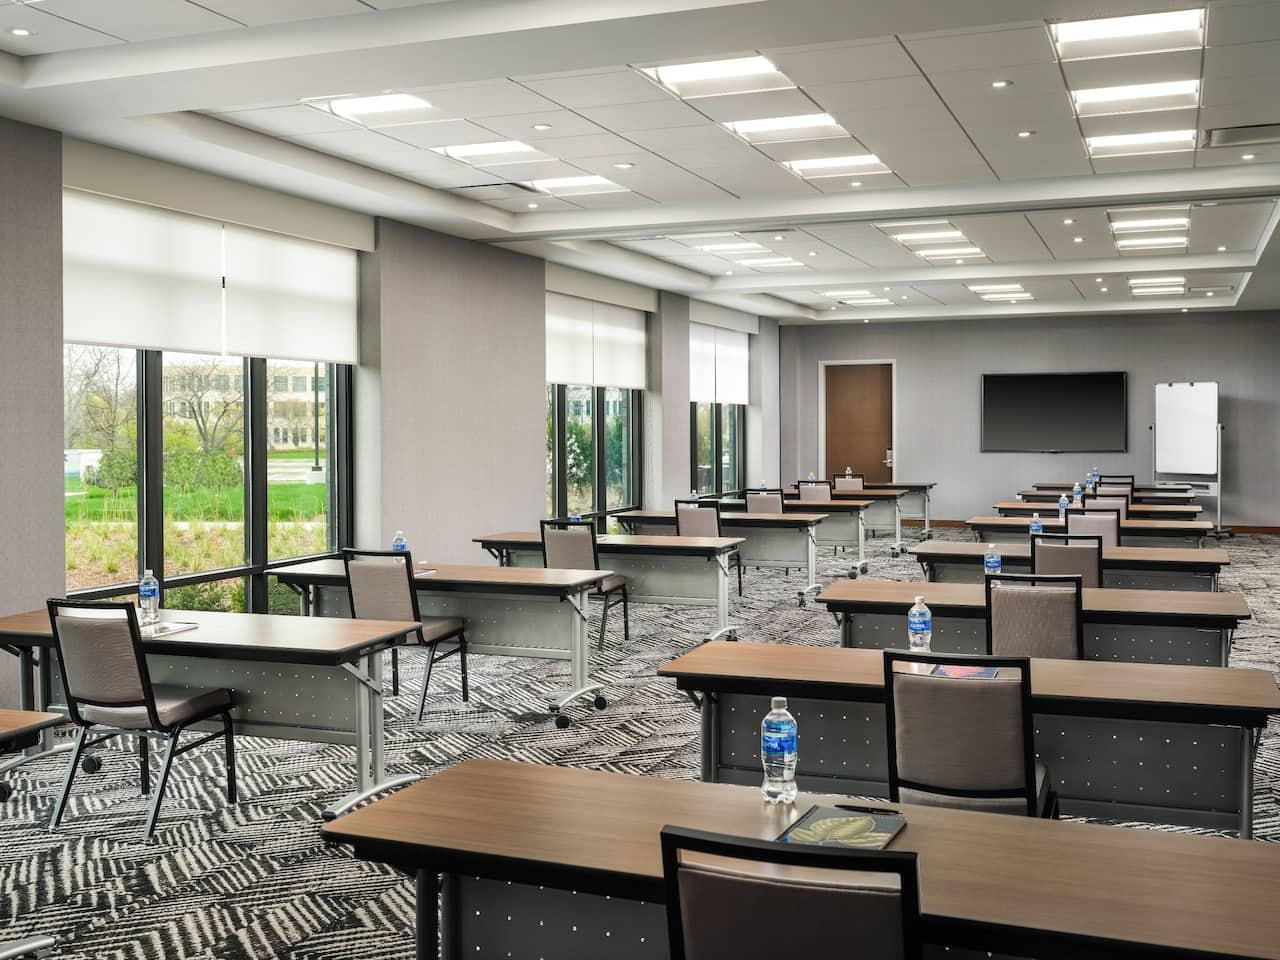 Lupine Room Classroom